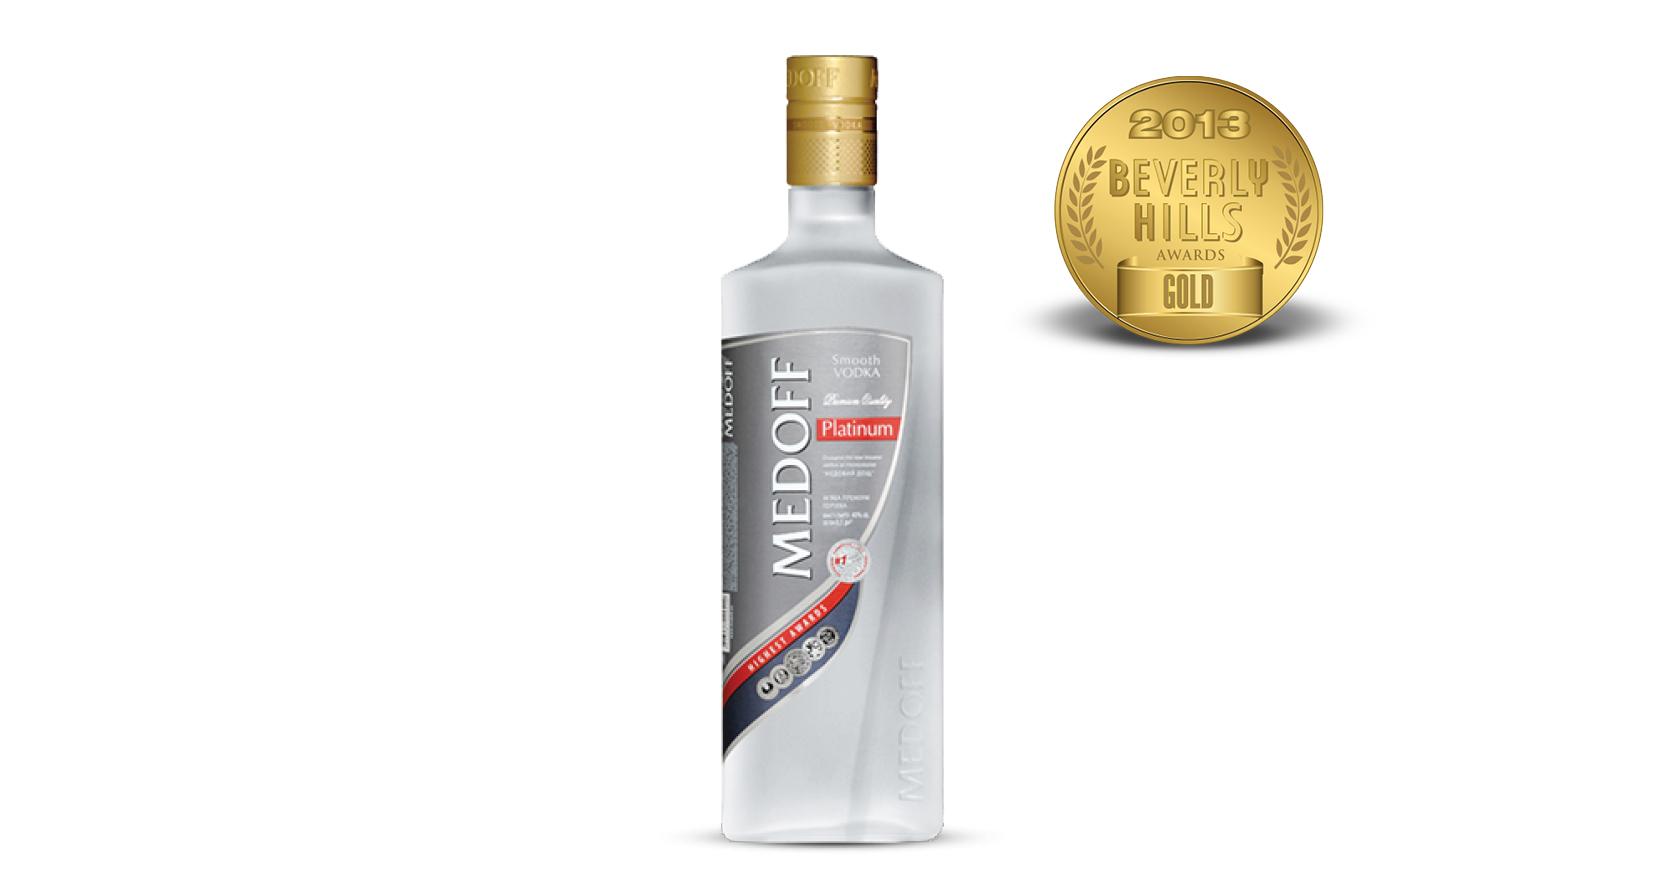 Medoff Platinum Vodka